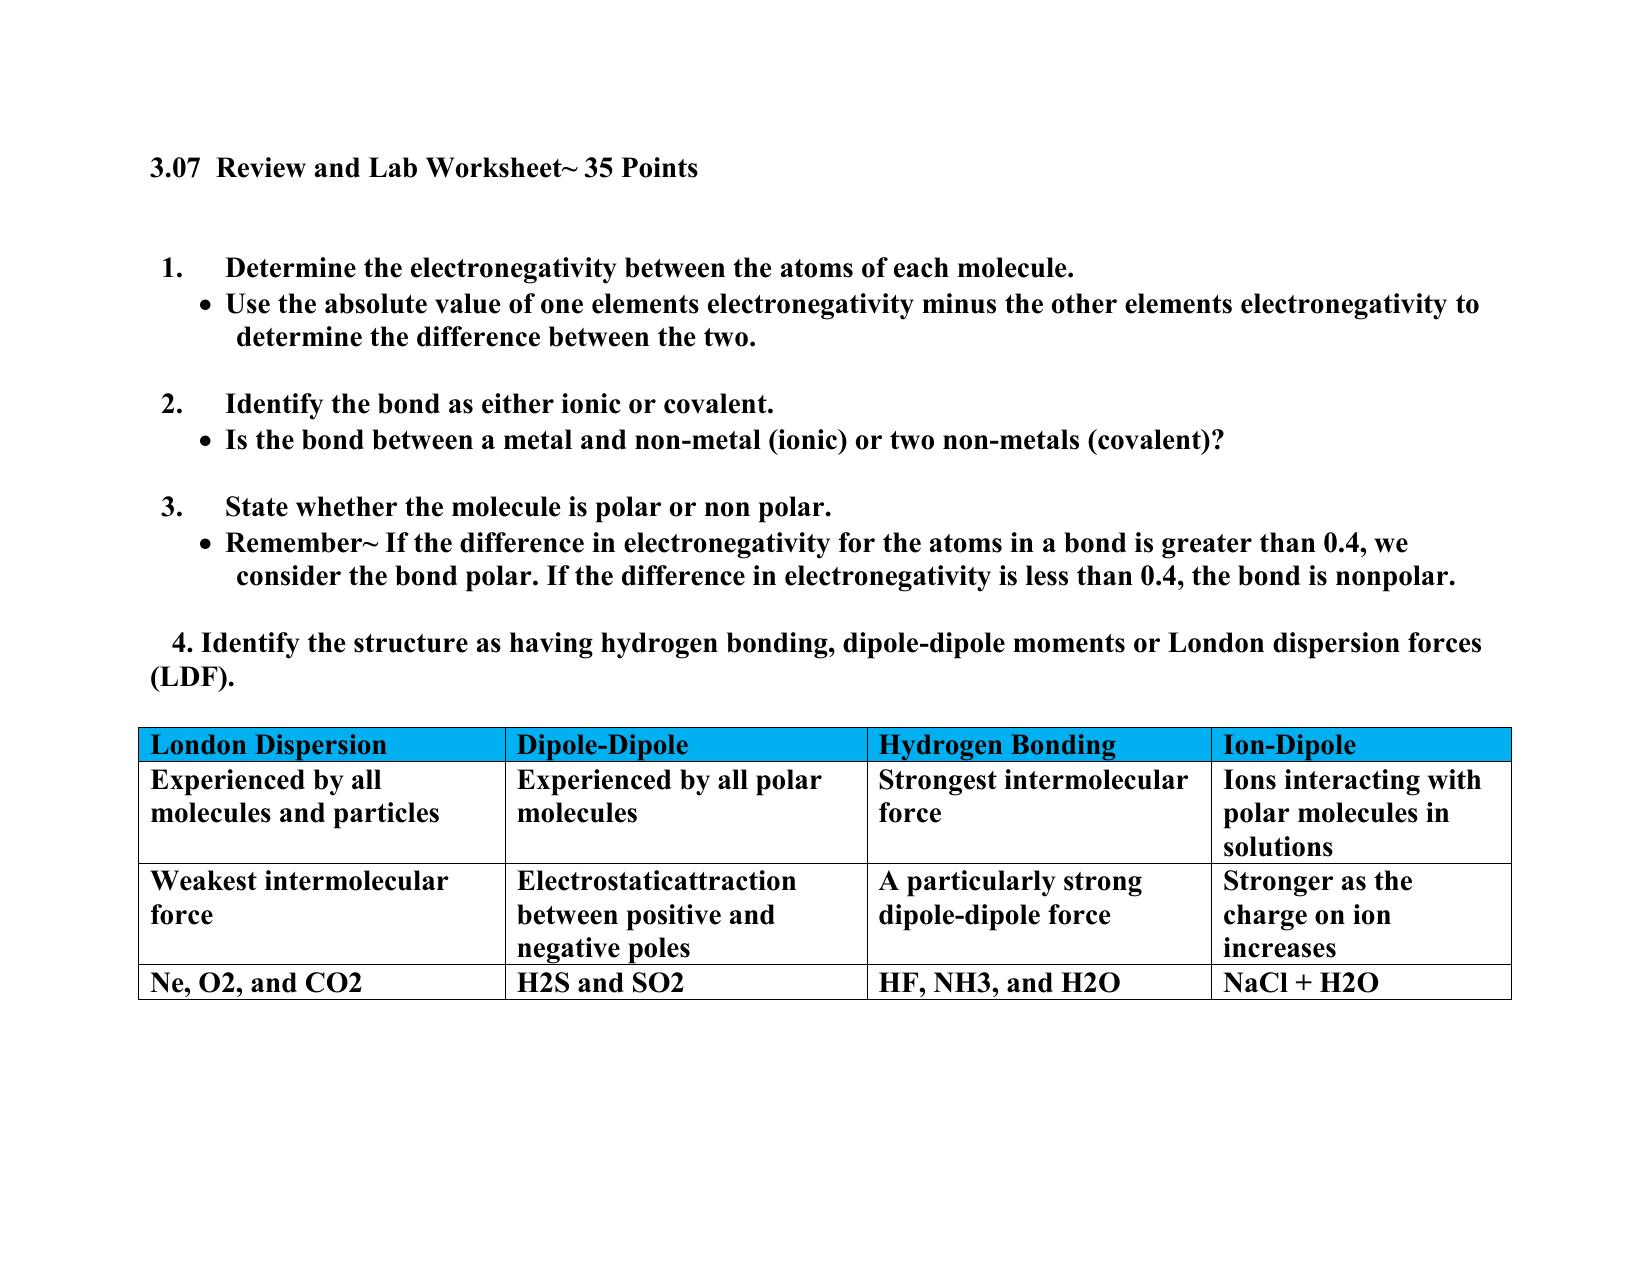 3.07 Lab Worksheet